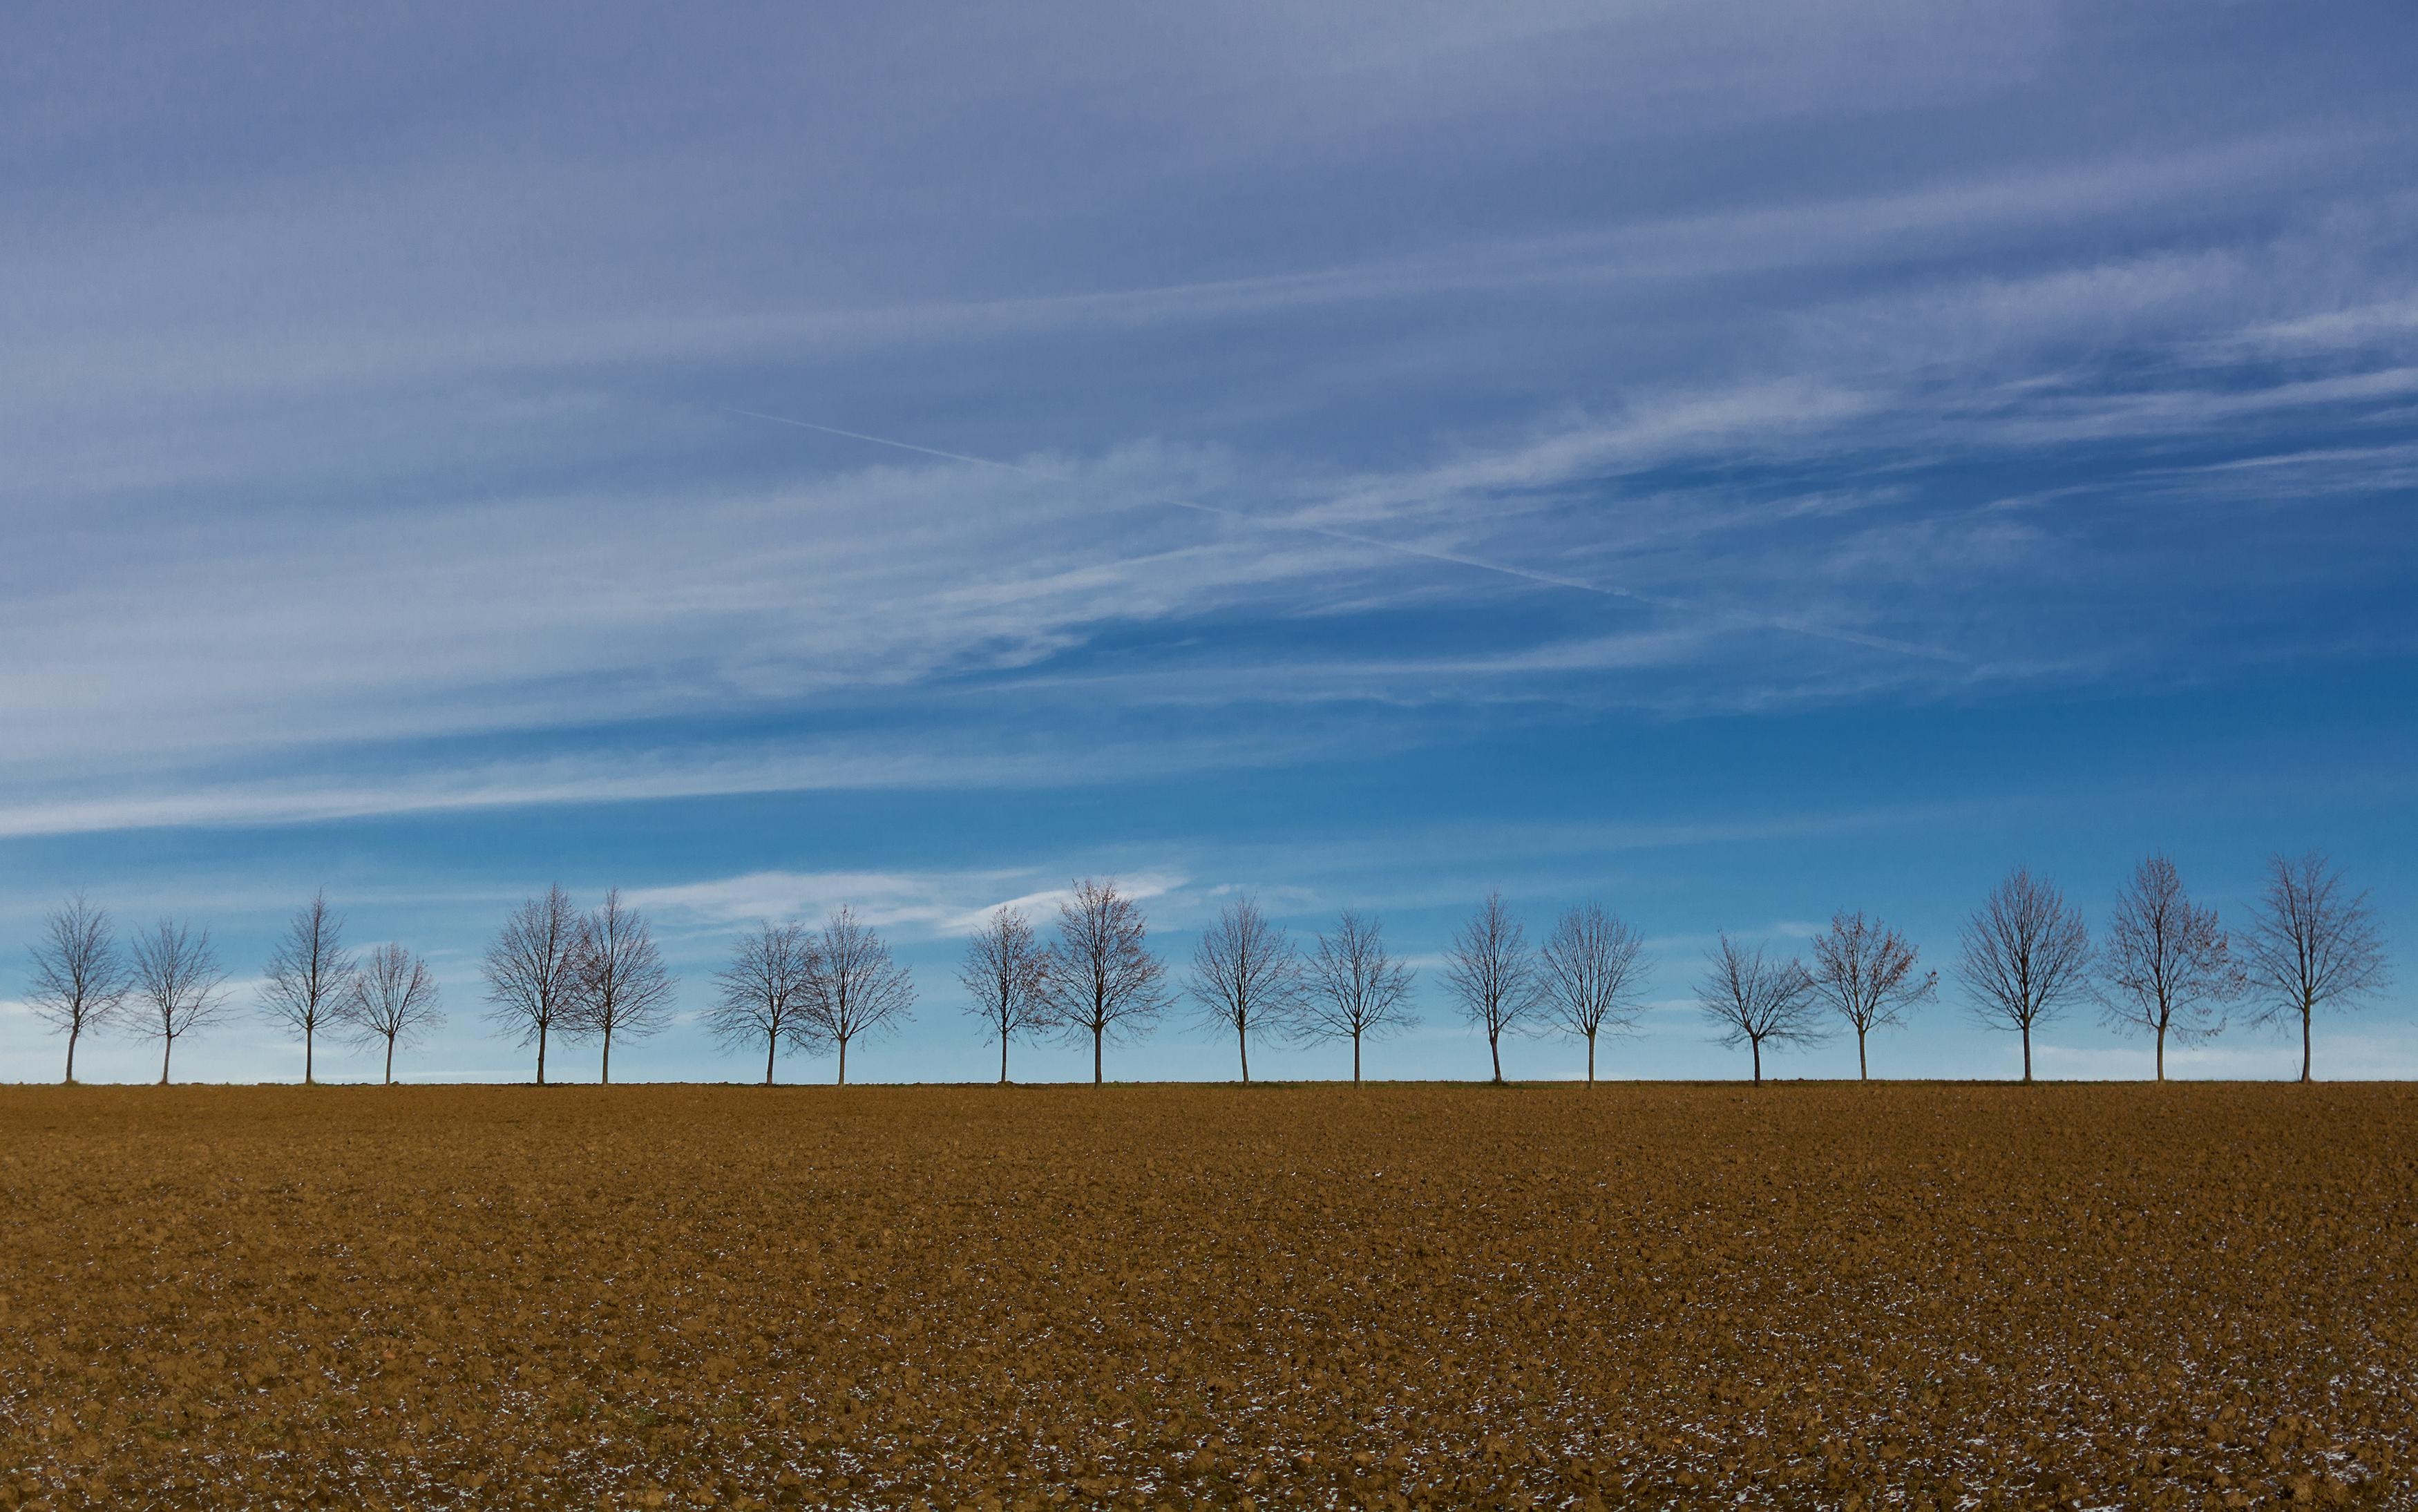 FREE IMAGE: Row of Trees on the Horizon - Libreshot Public ...